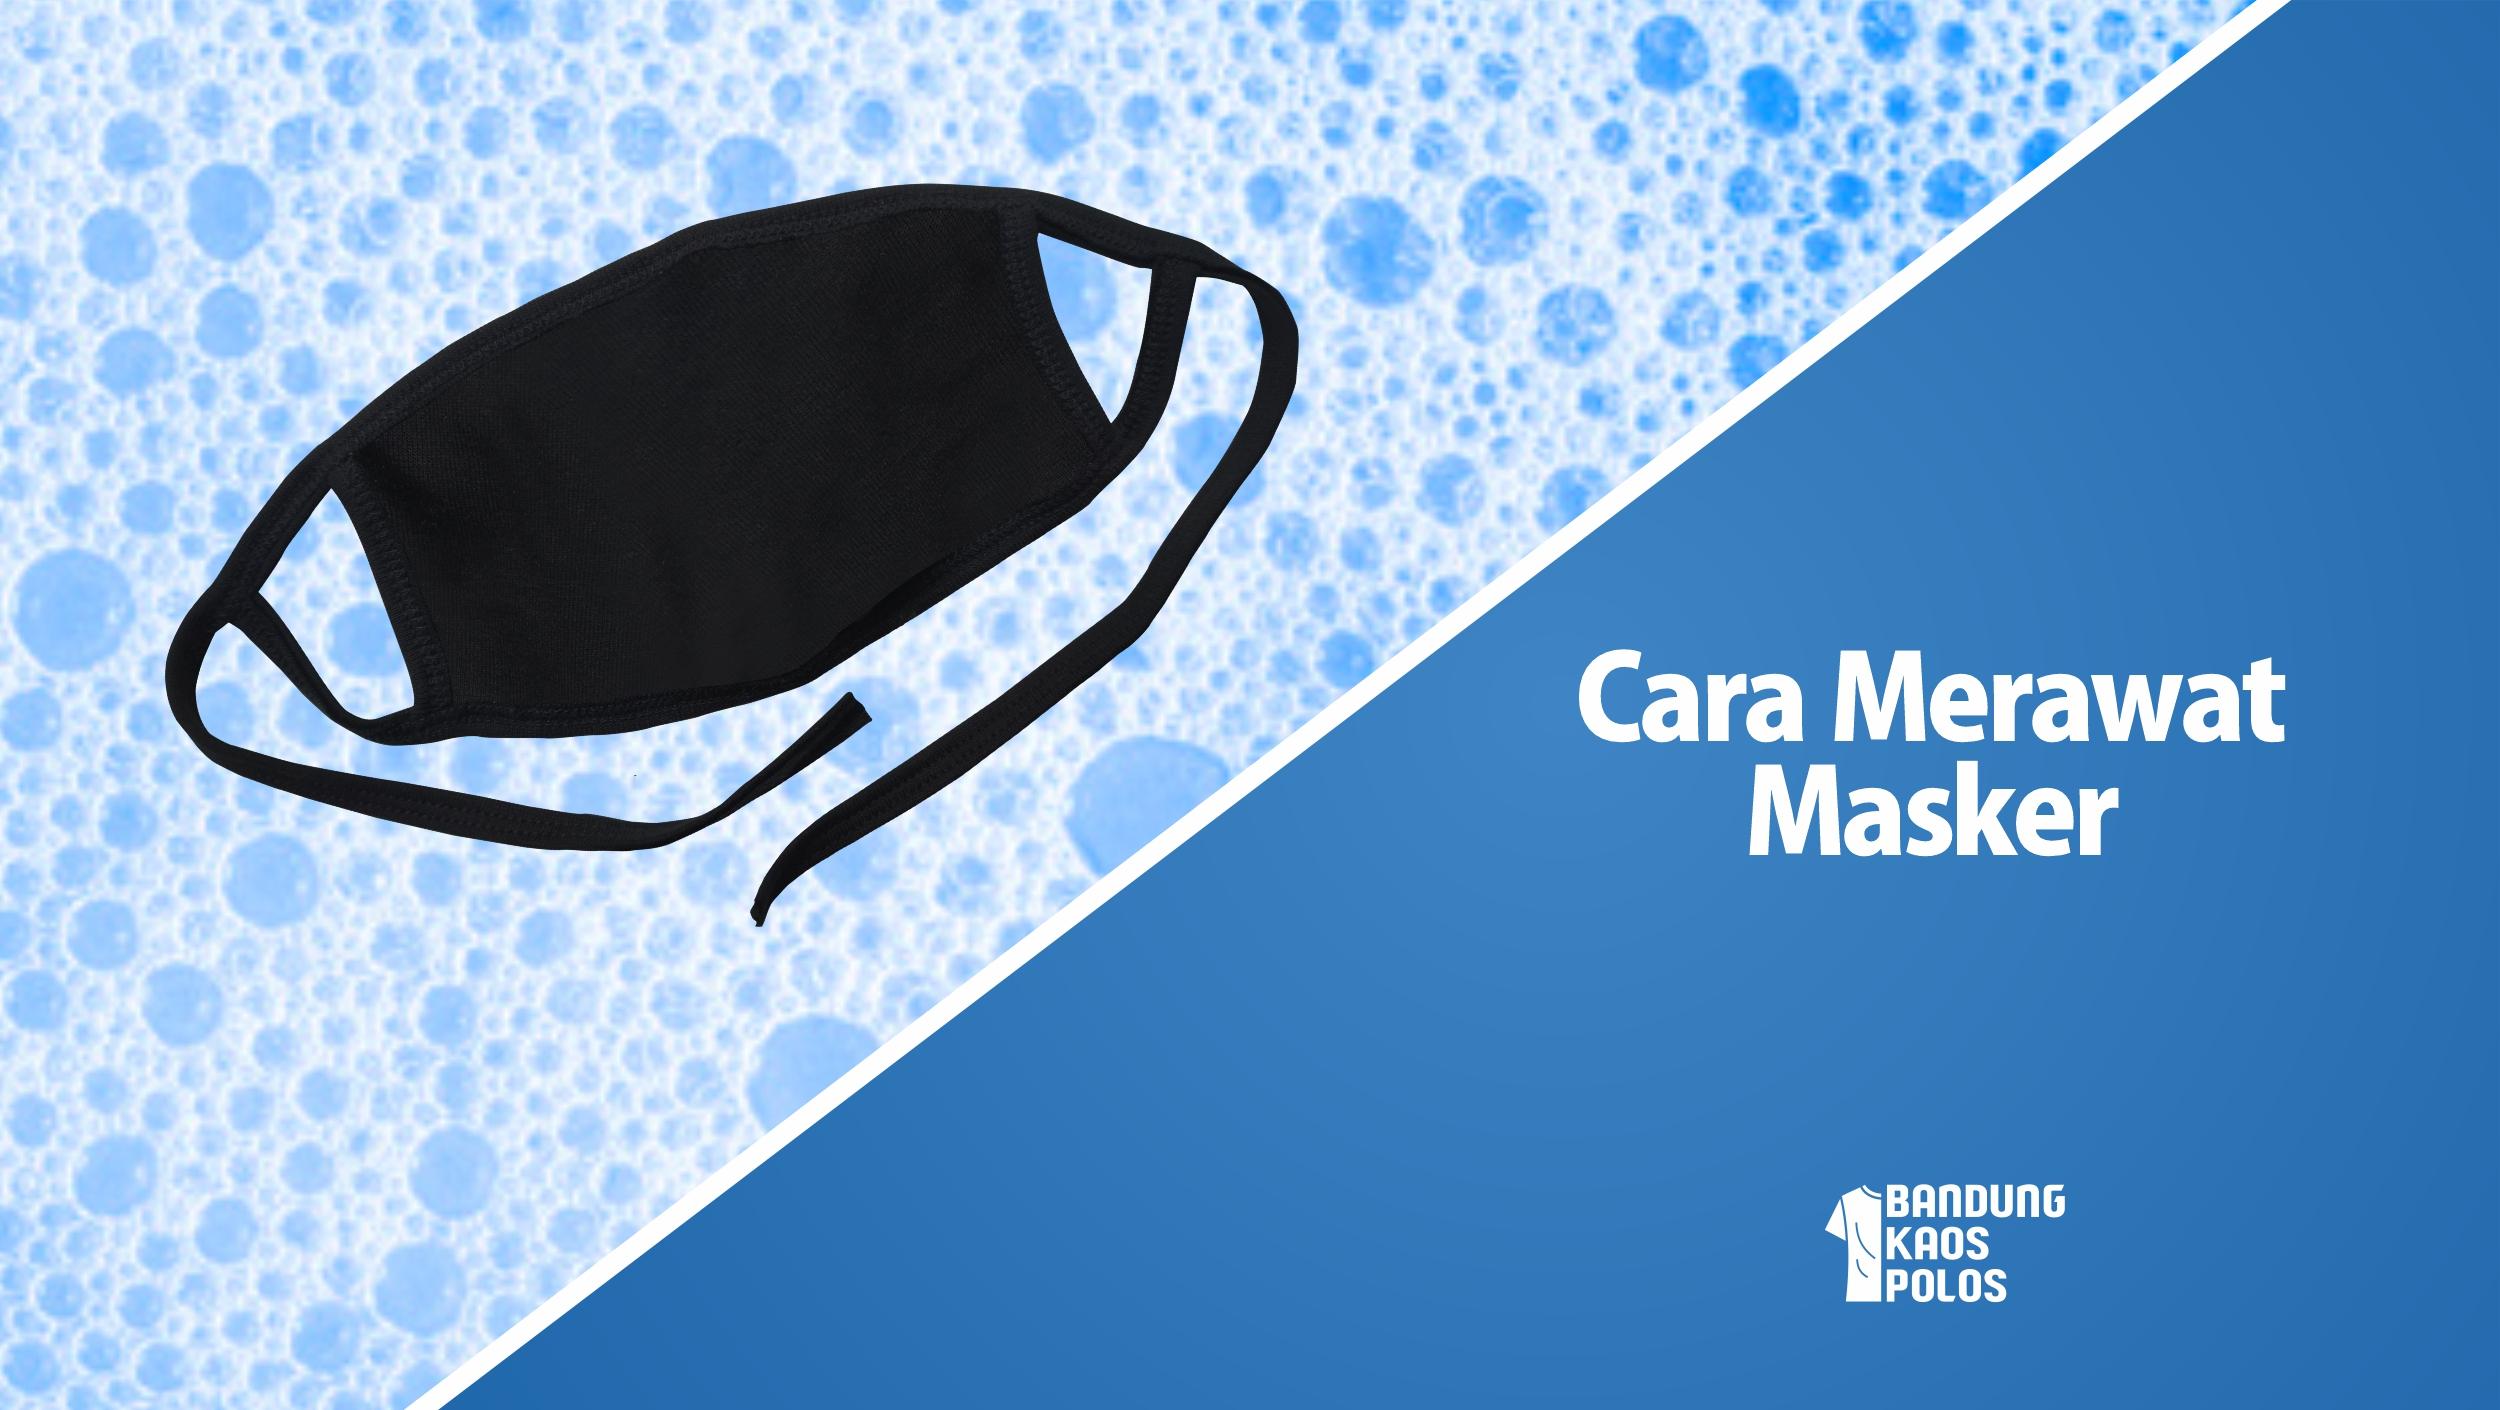 cara merawat masker